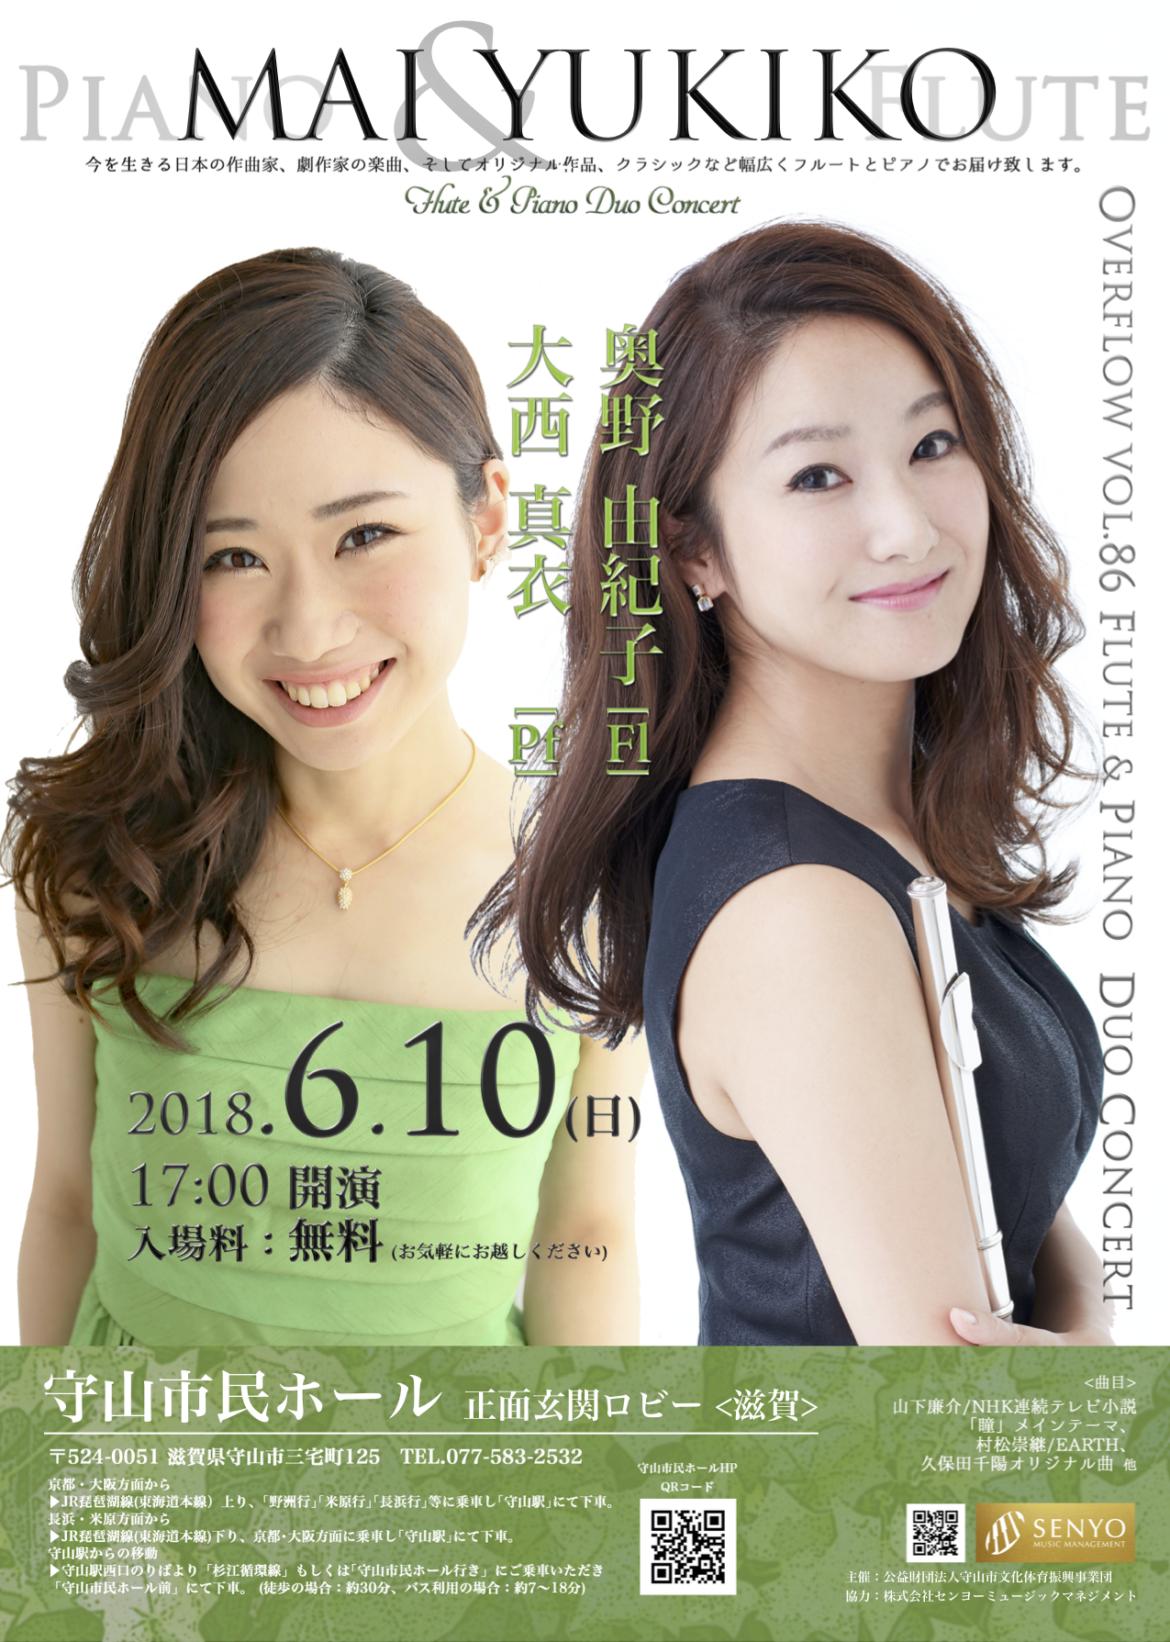 2018.6.10 overflow  vol.86  奥野由紀子×大西真衣 デュオコンサート